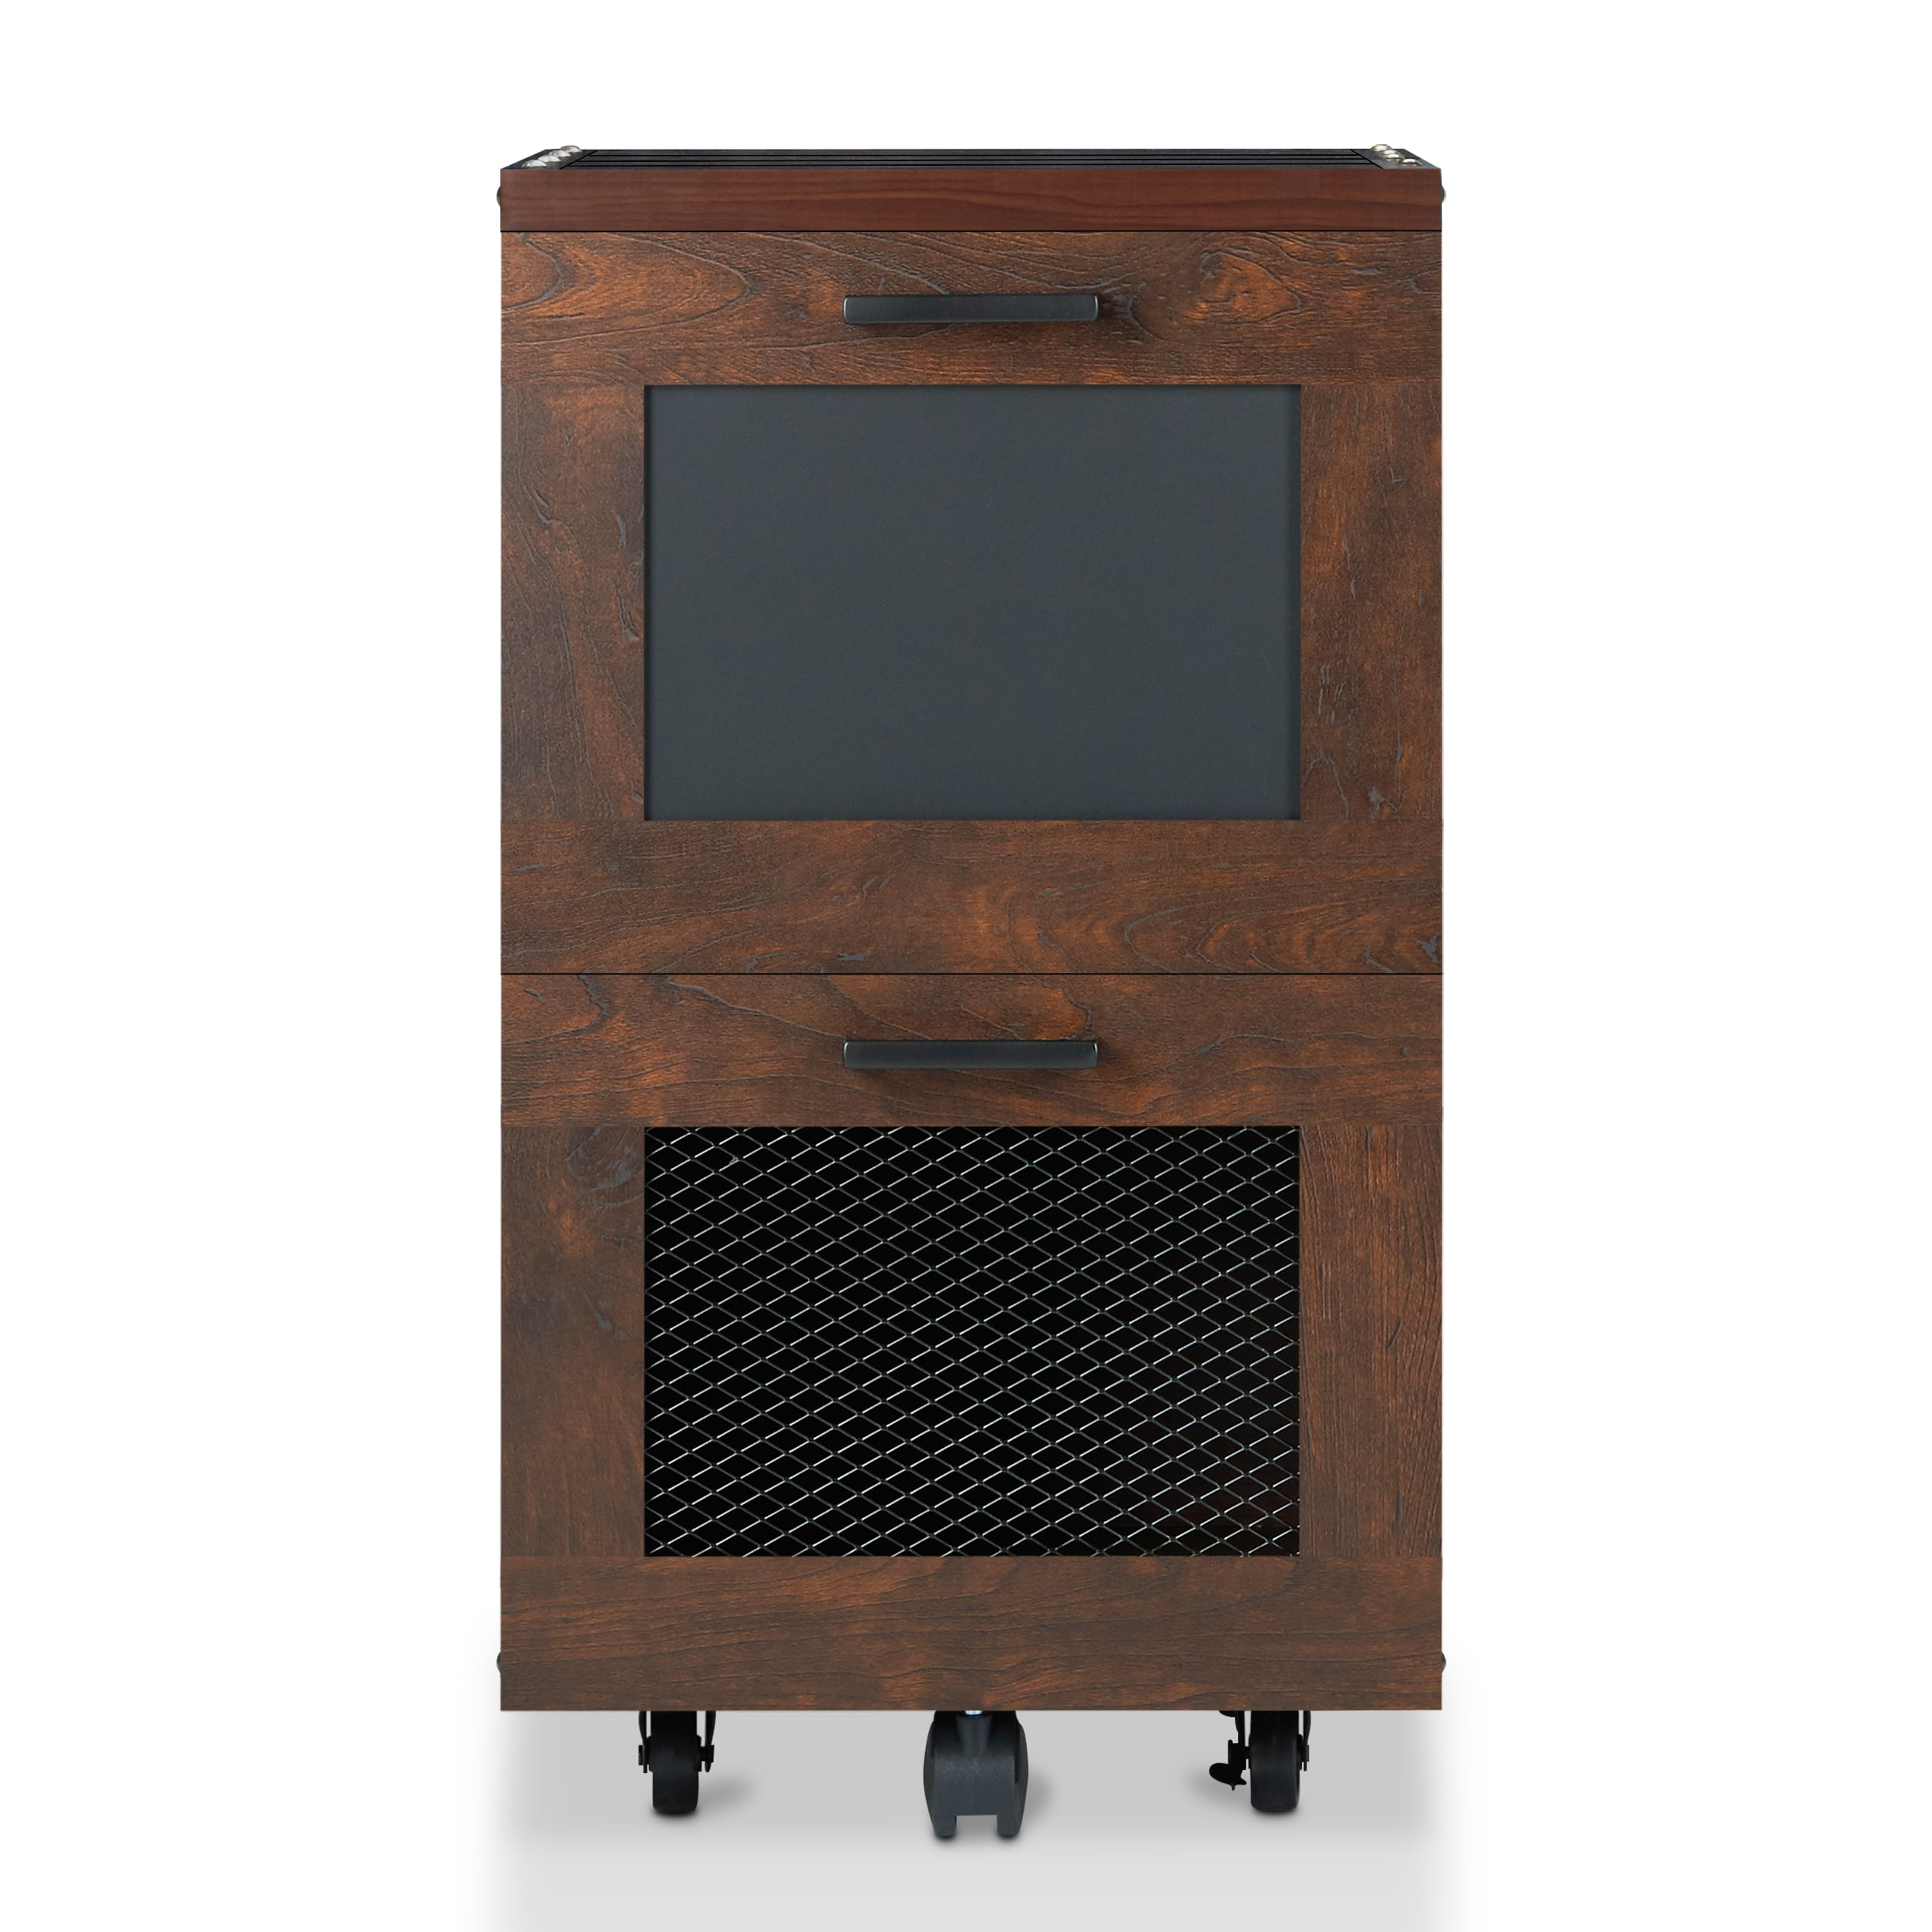 PREMIUM Tayler Rustic Vintage Walnut 2-drawer File Cabinet-NEW